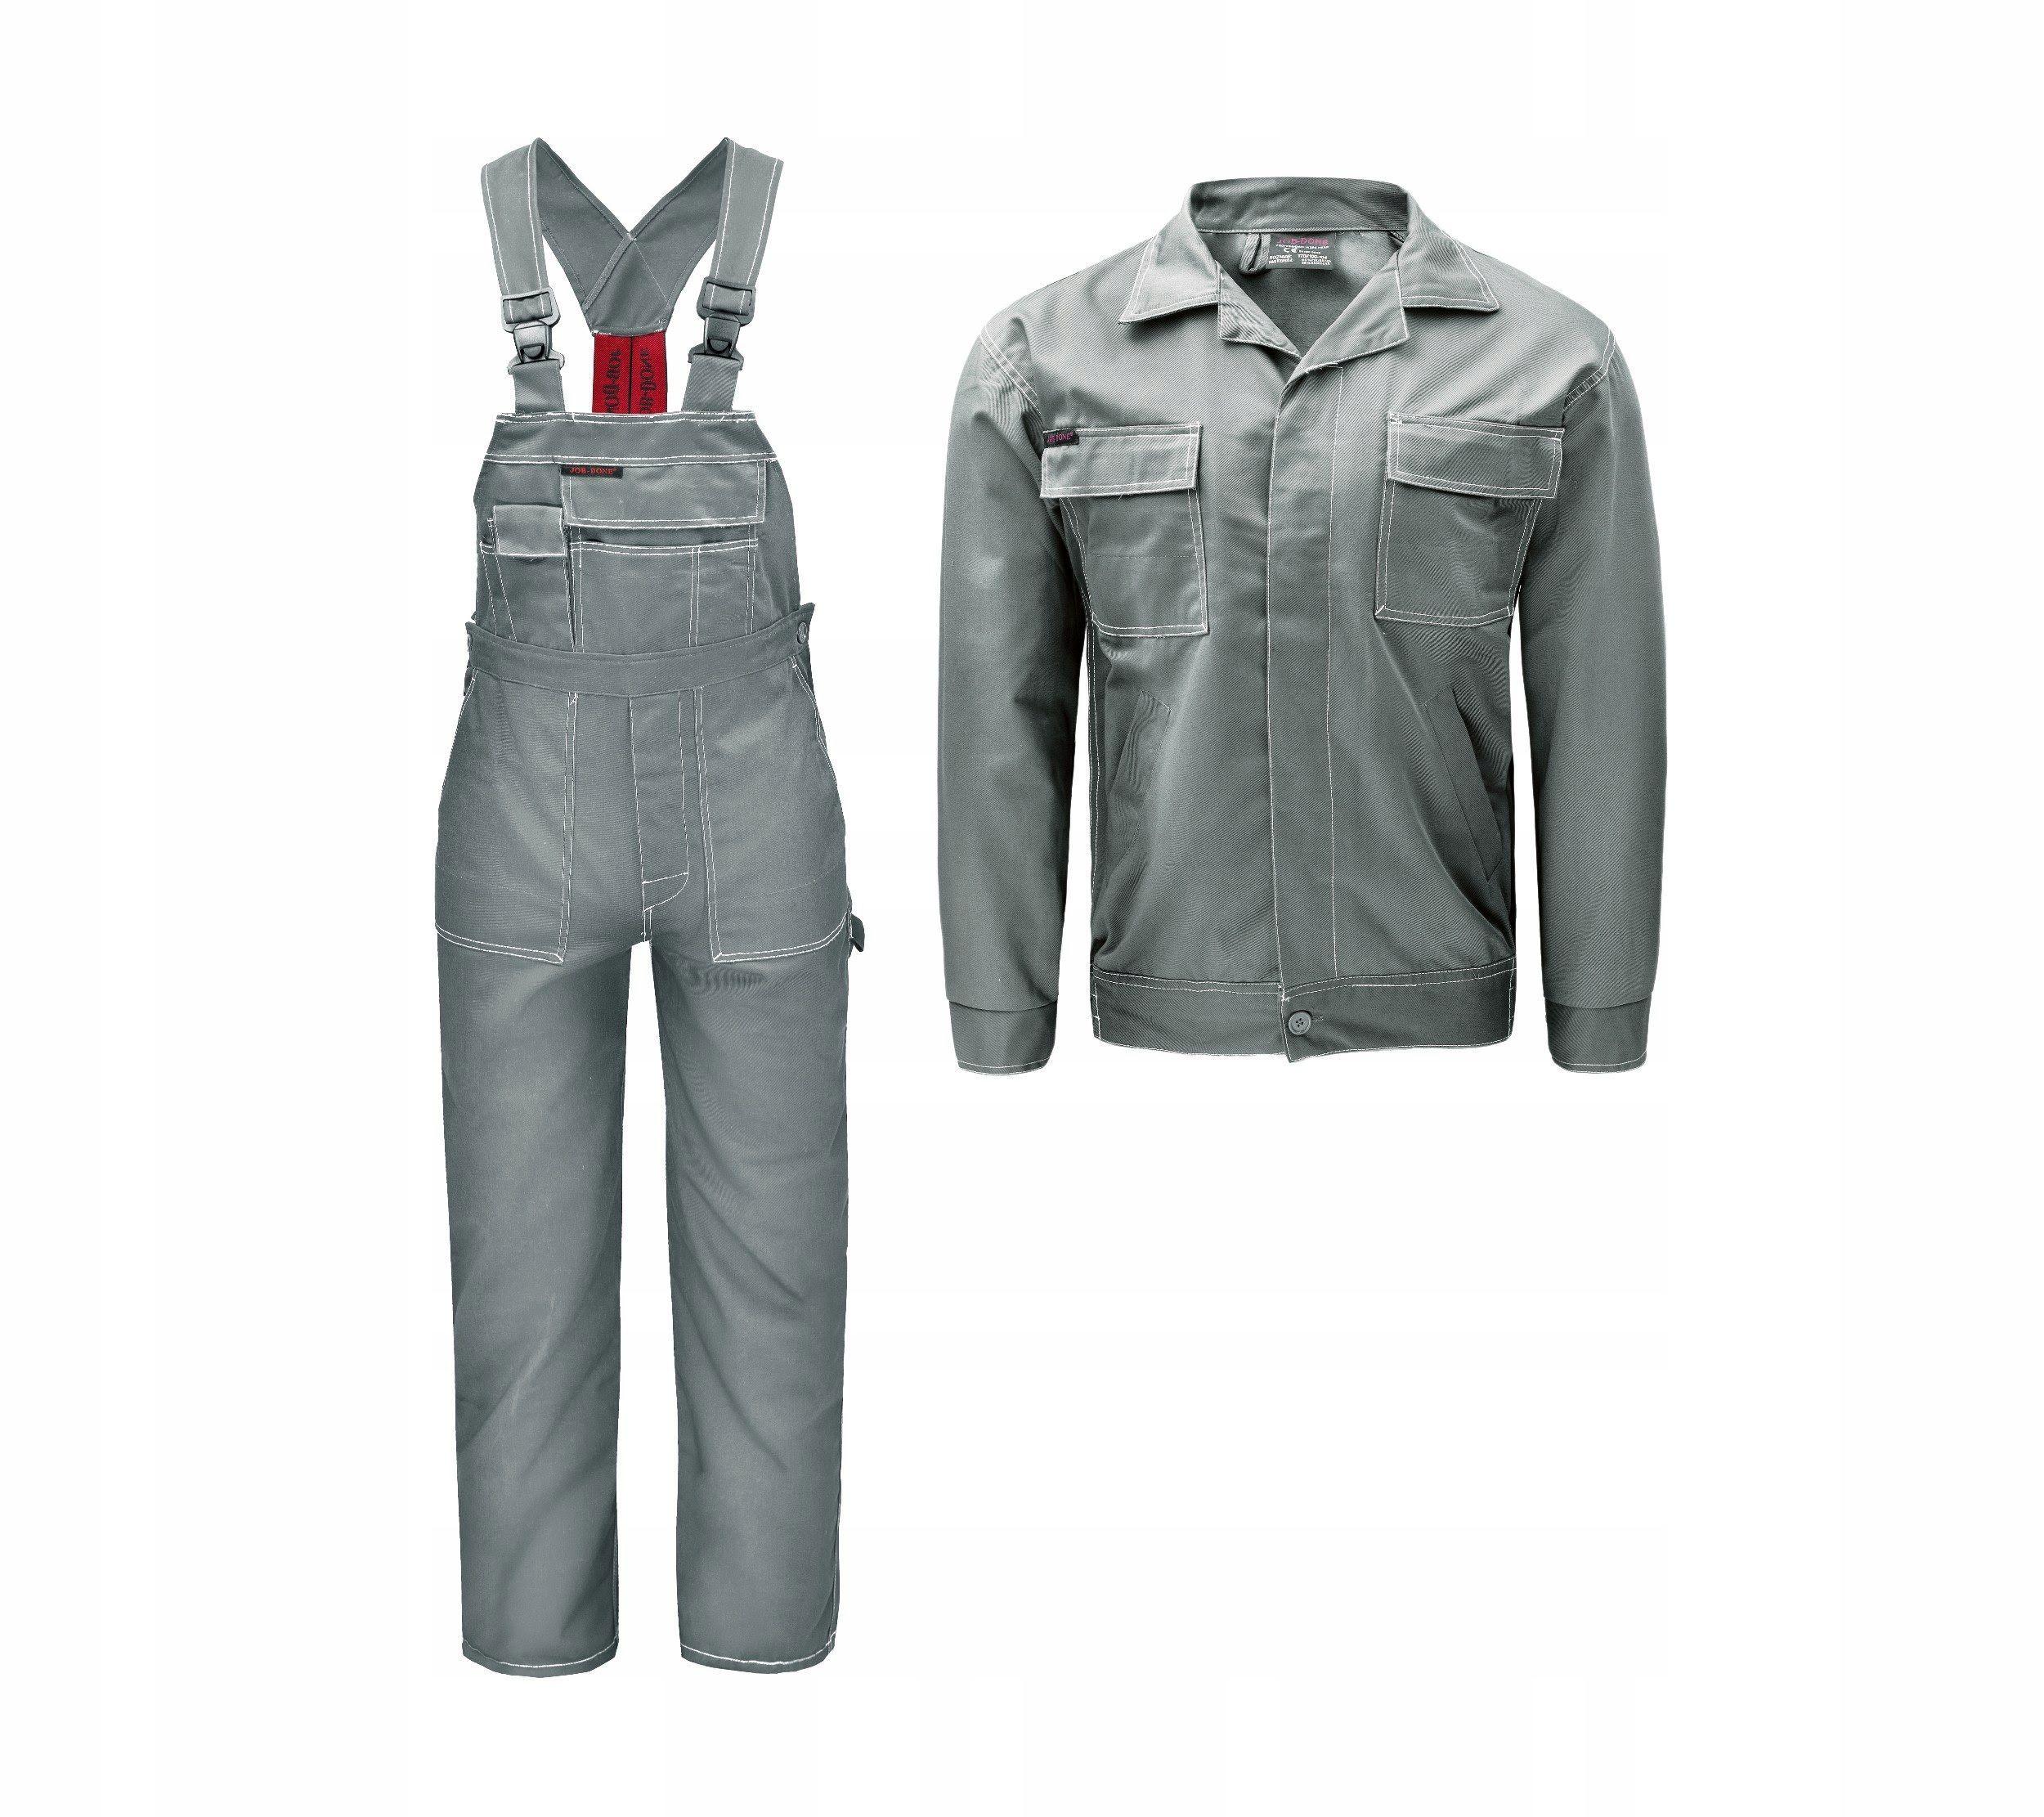 Ubranie robocze Job-Done Respect 290g/m2 S194/100